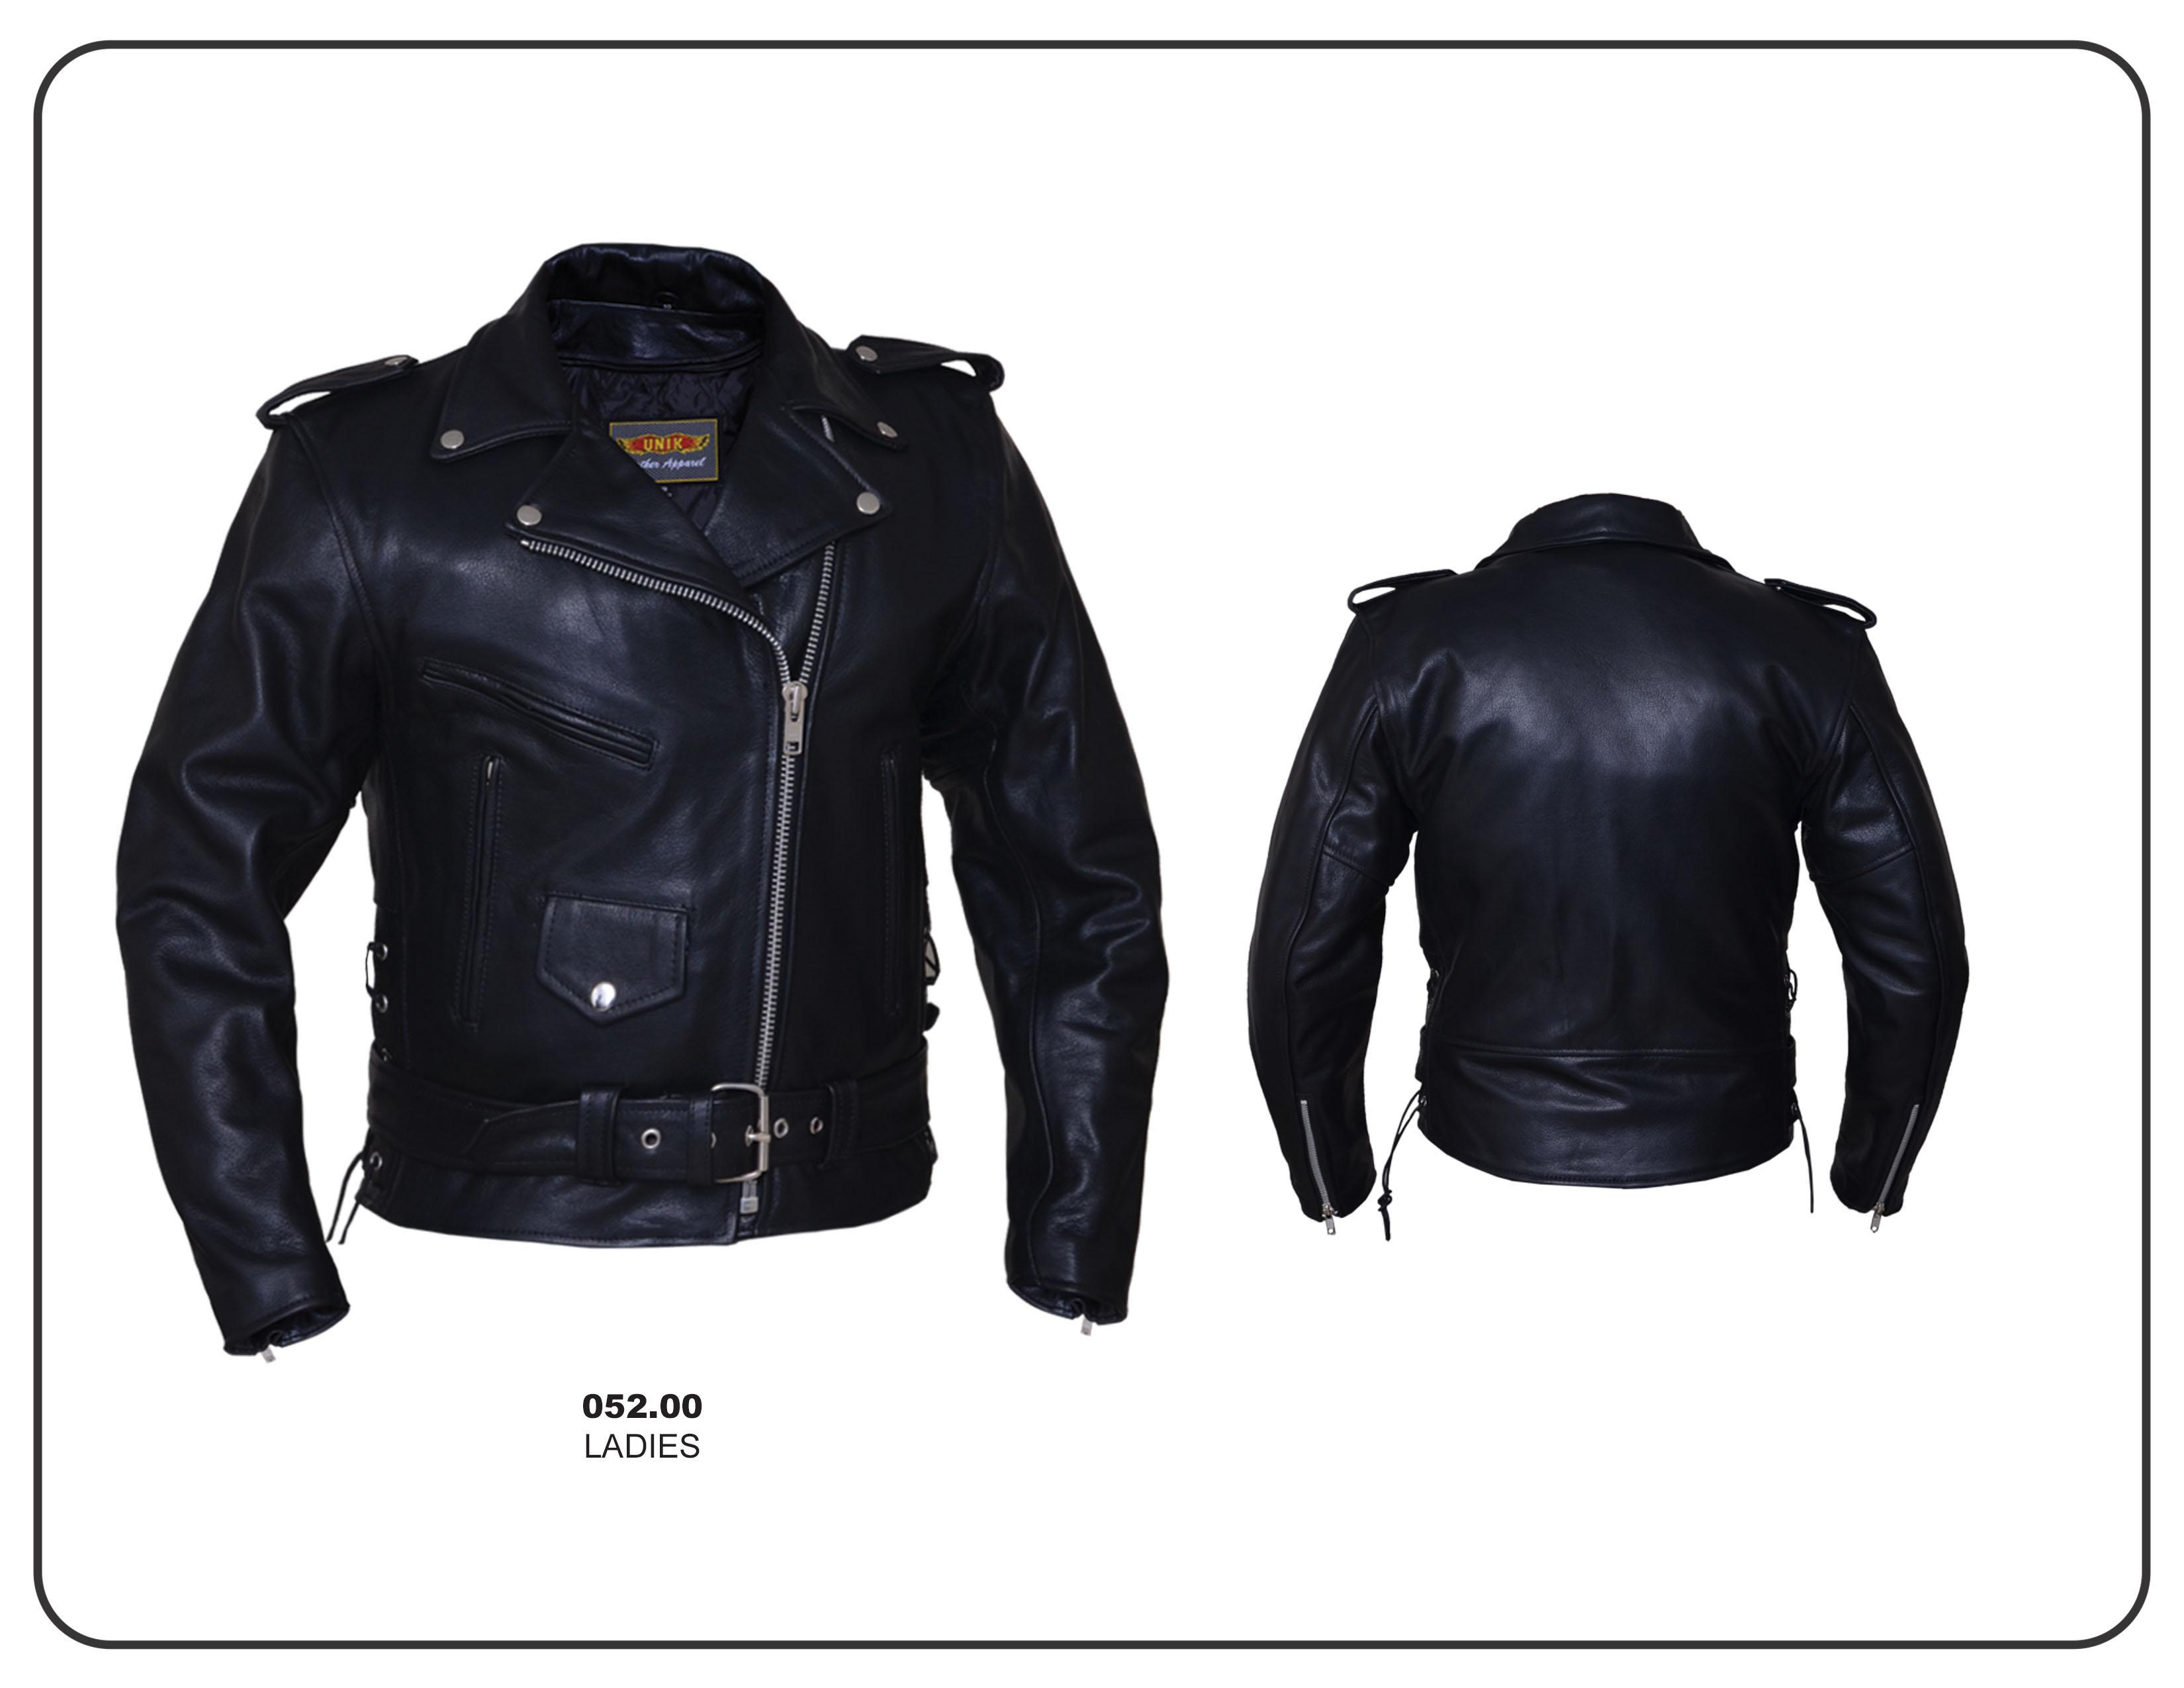 Leather jacket with roses - Premium Buffalo Womens Motorcycle Jacket By Unik Leather